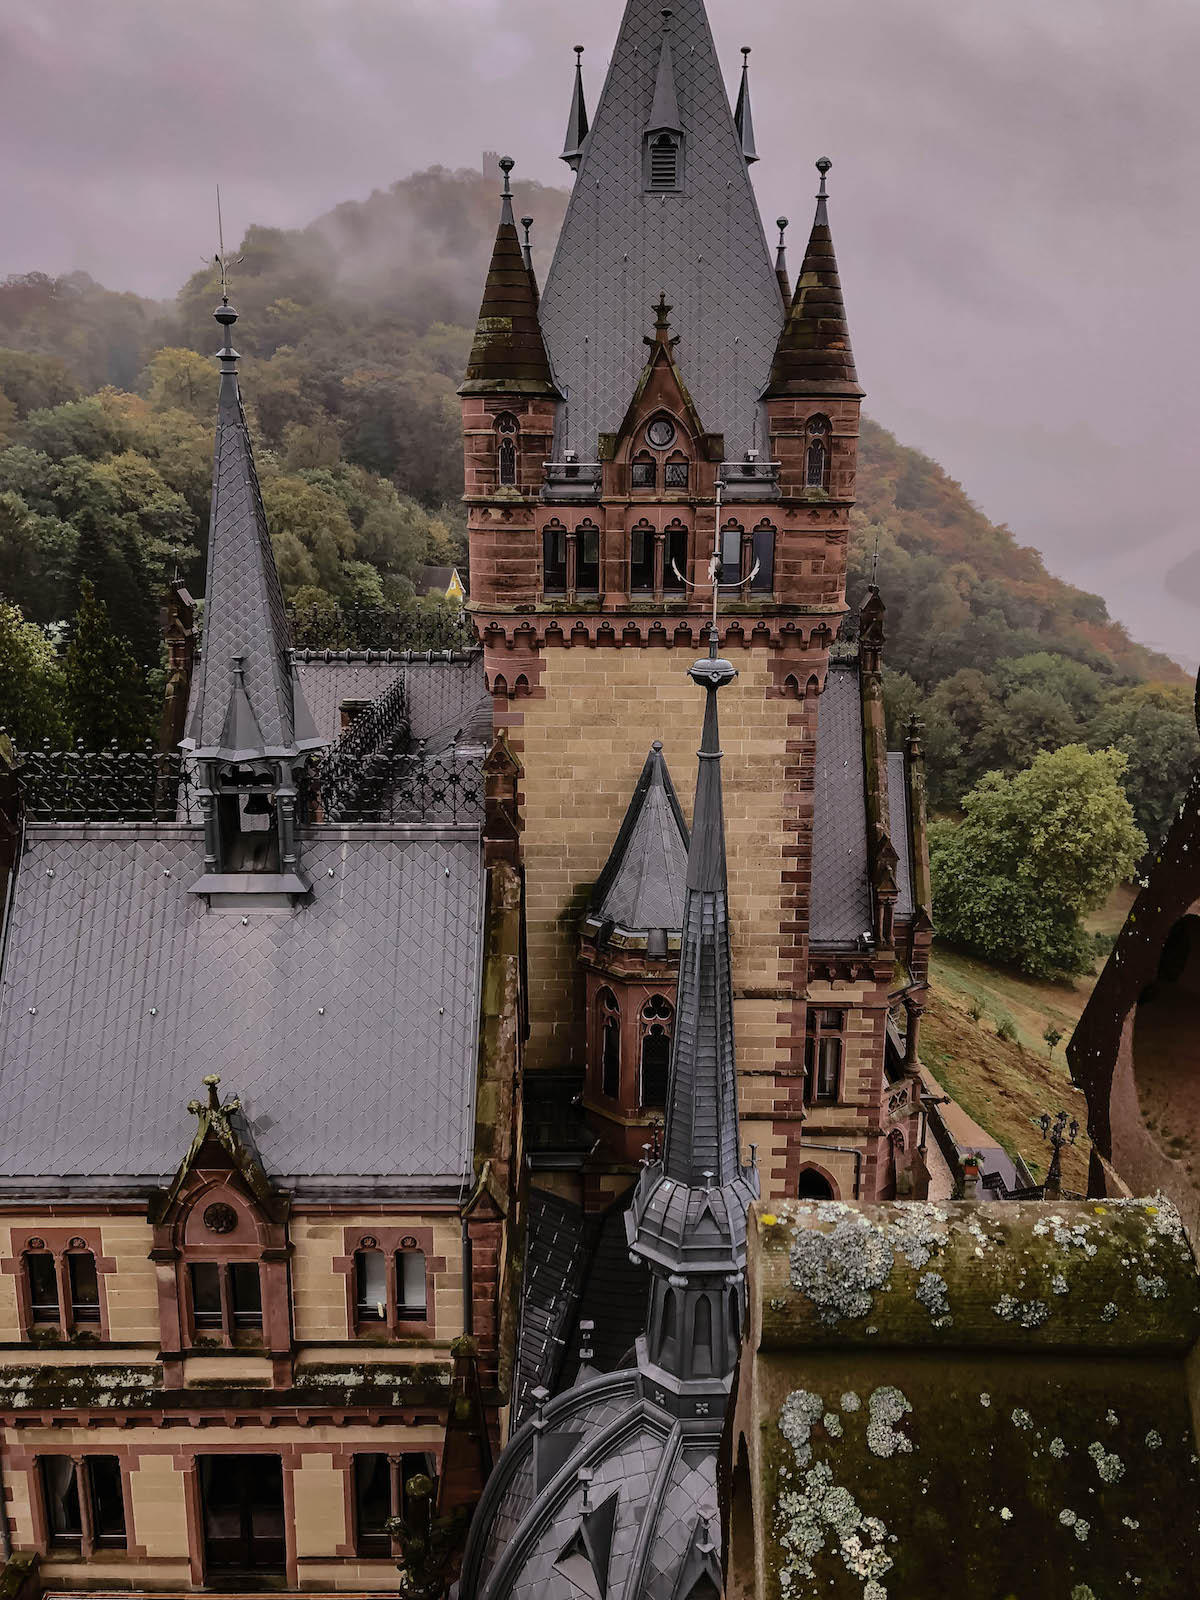 Drachenburg Castle Germany